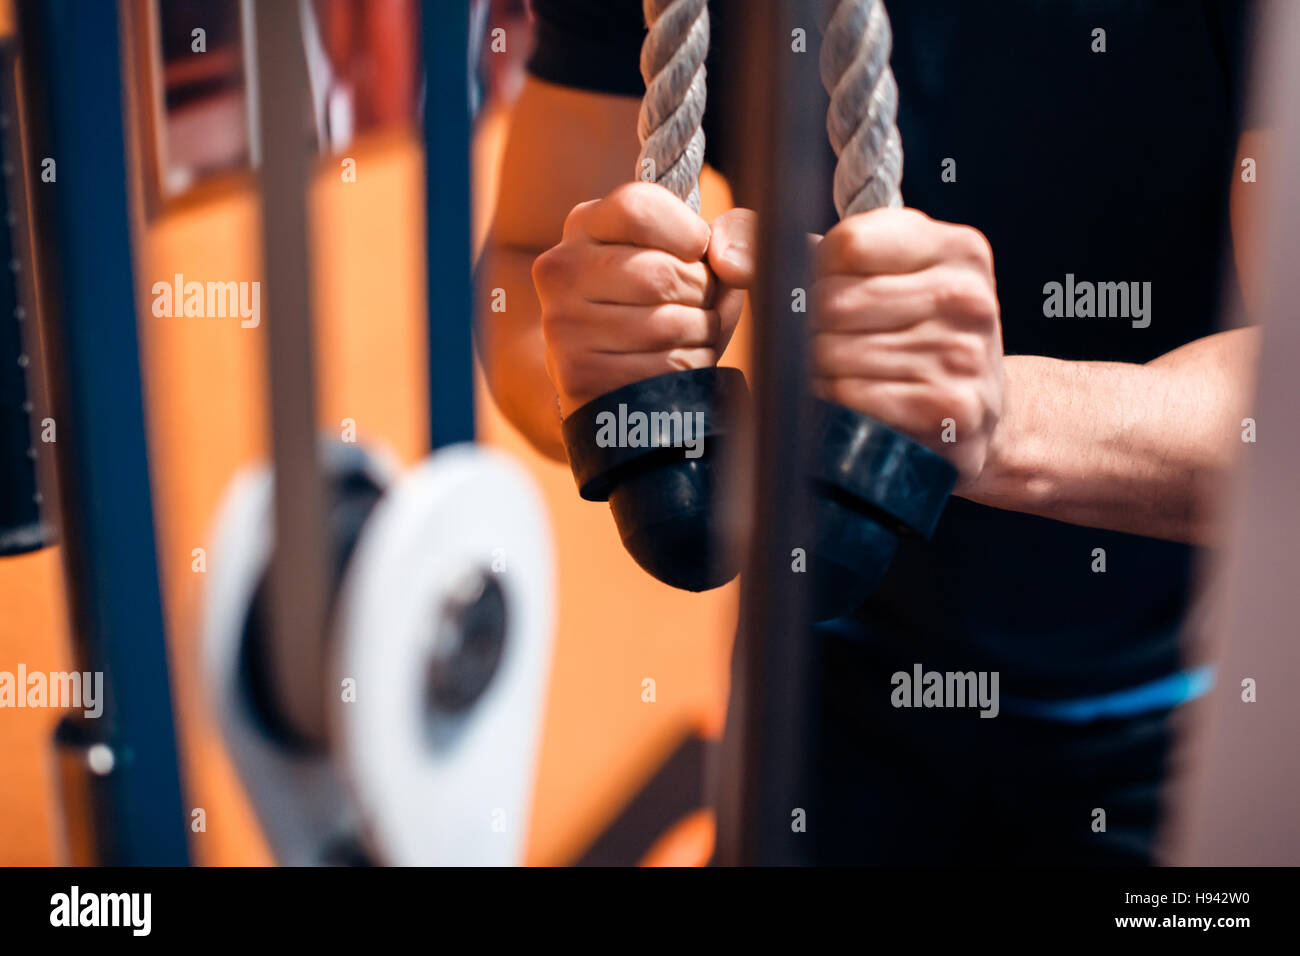 Trizeps-Übung mit Kabel Stockfoto